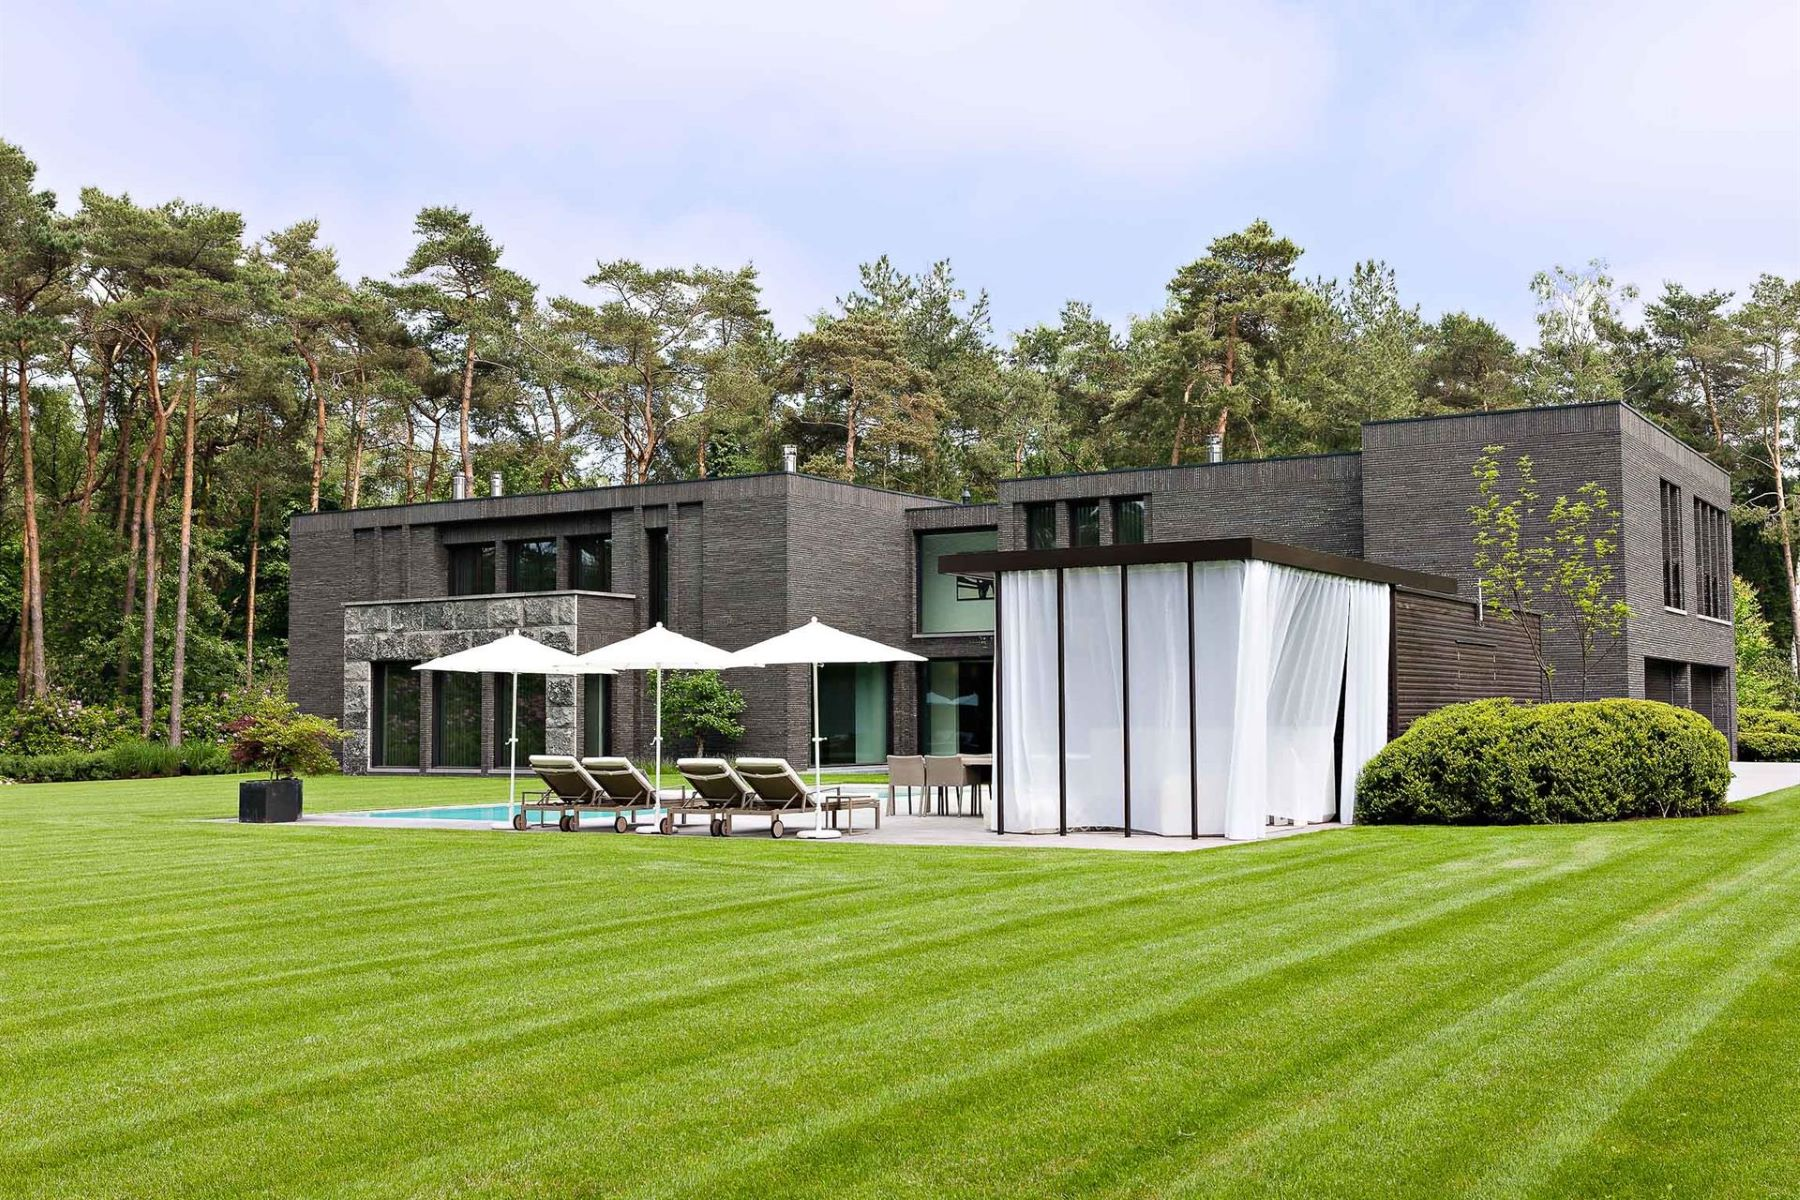 Single Family Homes for Sale at Antwerp I Kapellen Kapellen, Antwerp 2950 Belgium